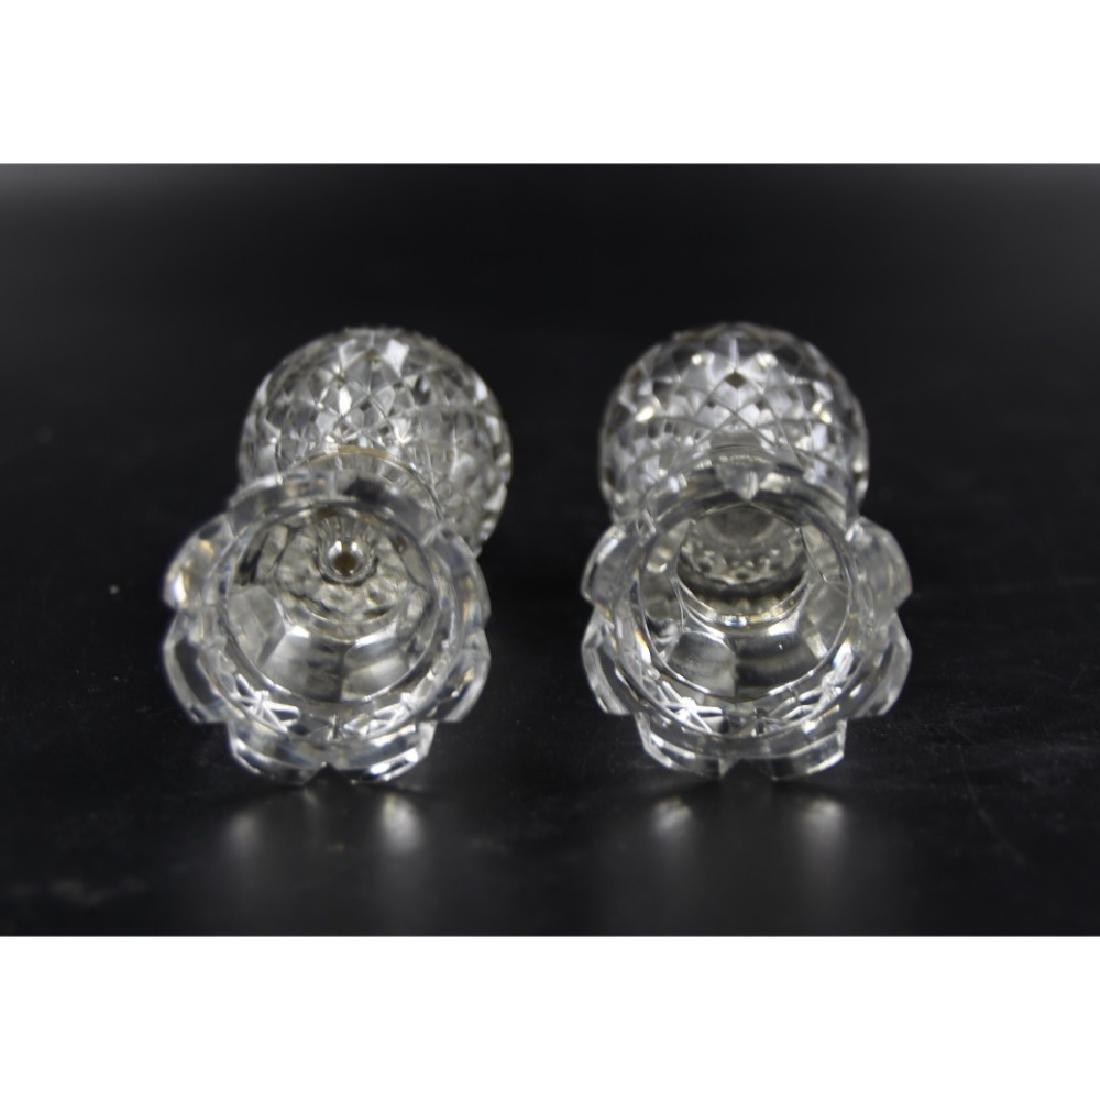 Lead Crystal Salt & Pepper Shakers - 2